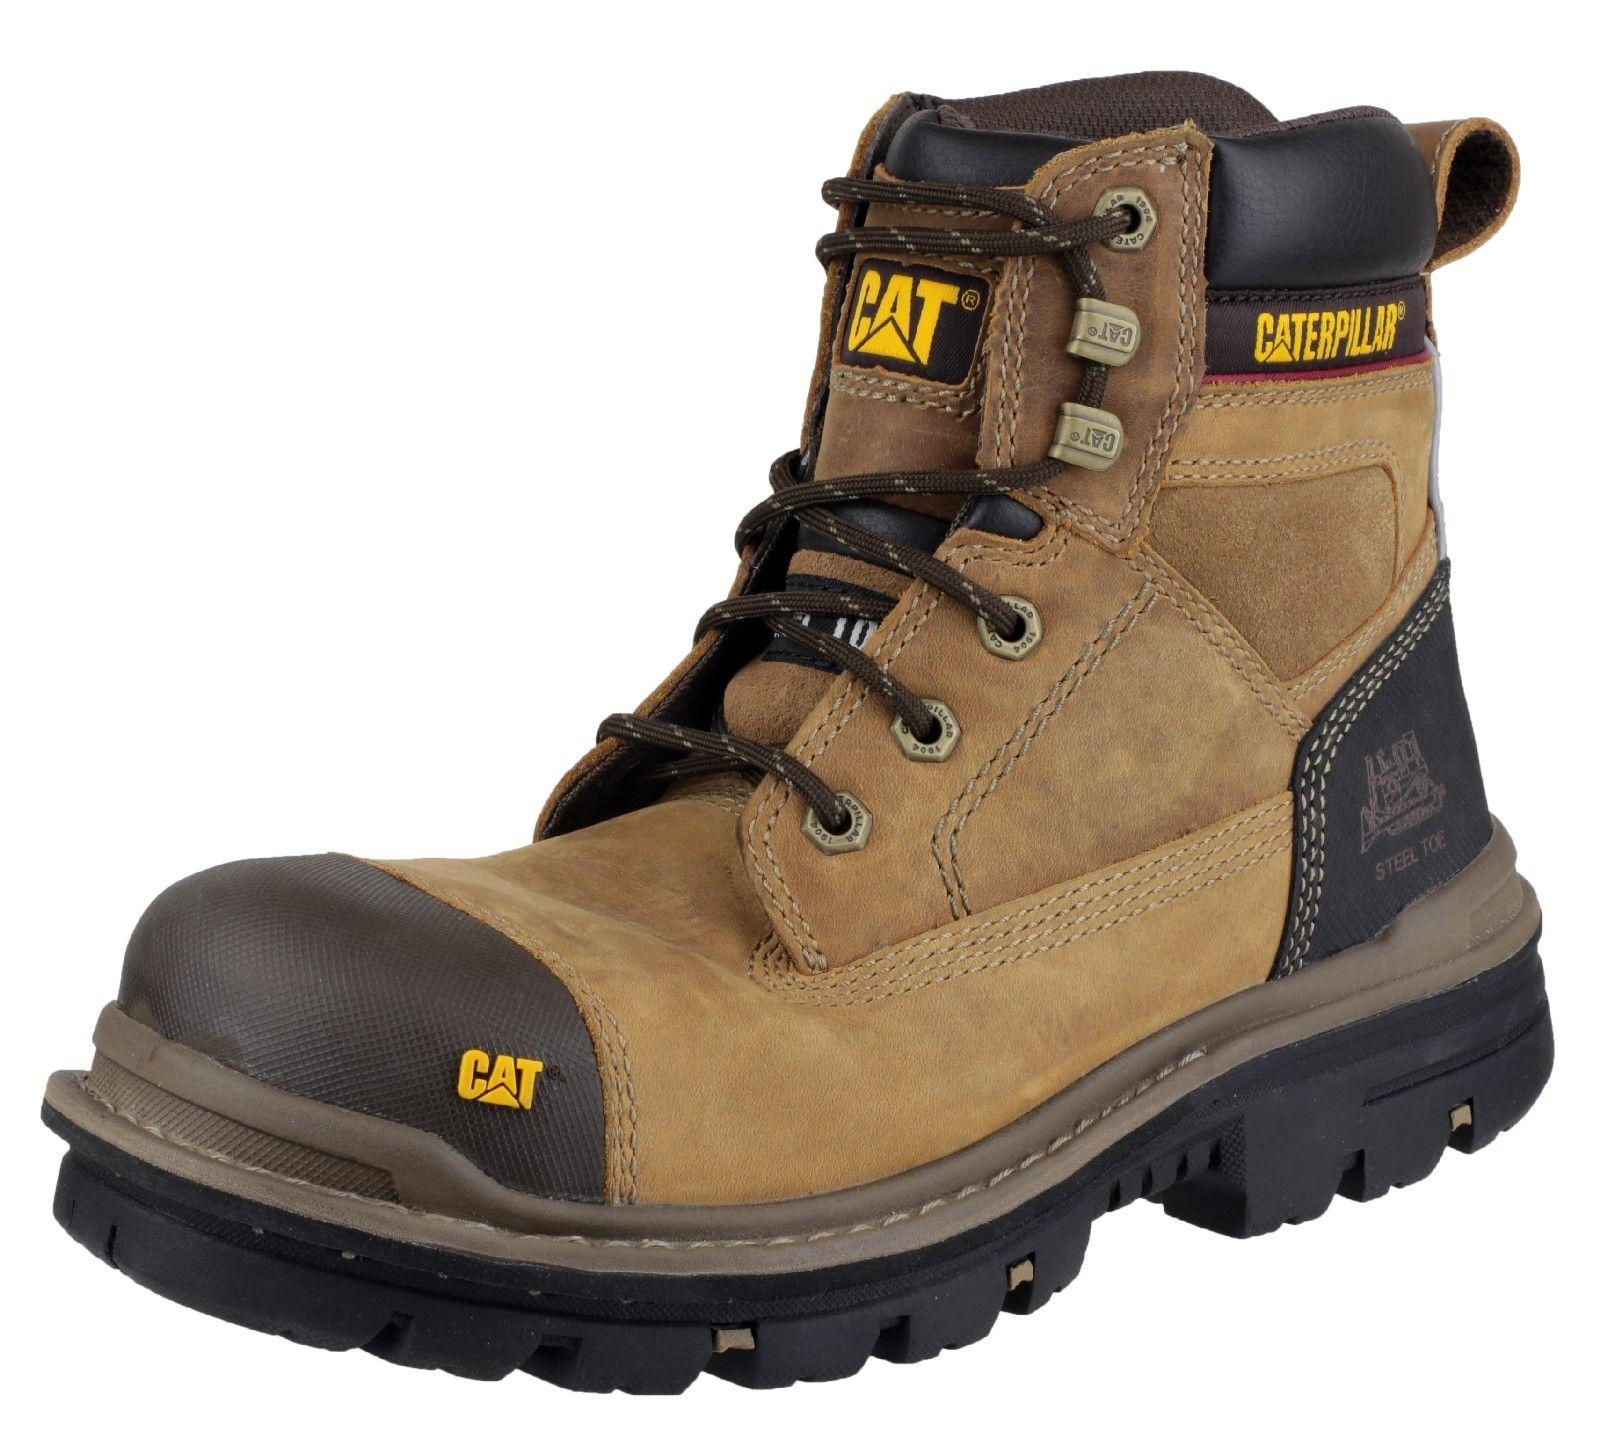 Mens CAT Caterpillar Gravel Steel Toe Cap Safety Work Boots Black Beige 6-12 | EBay